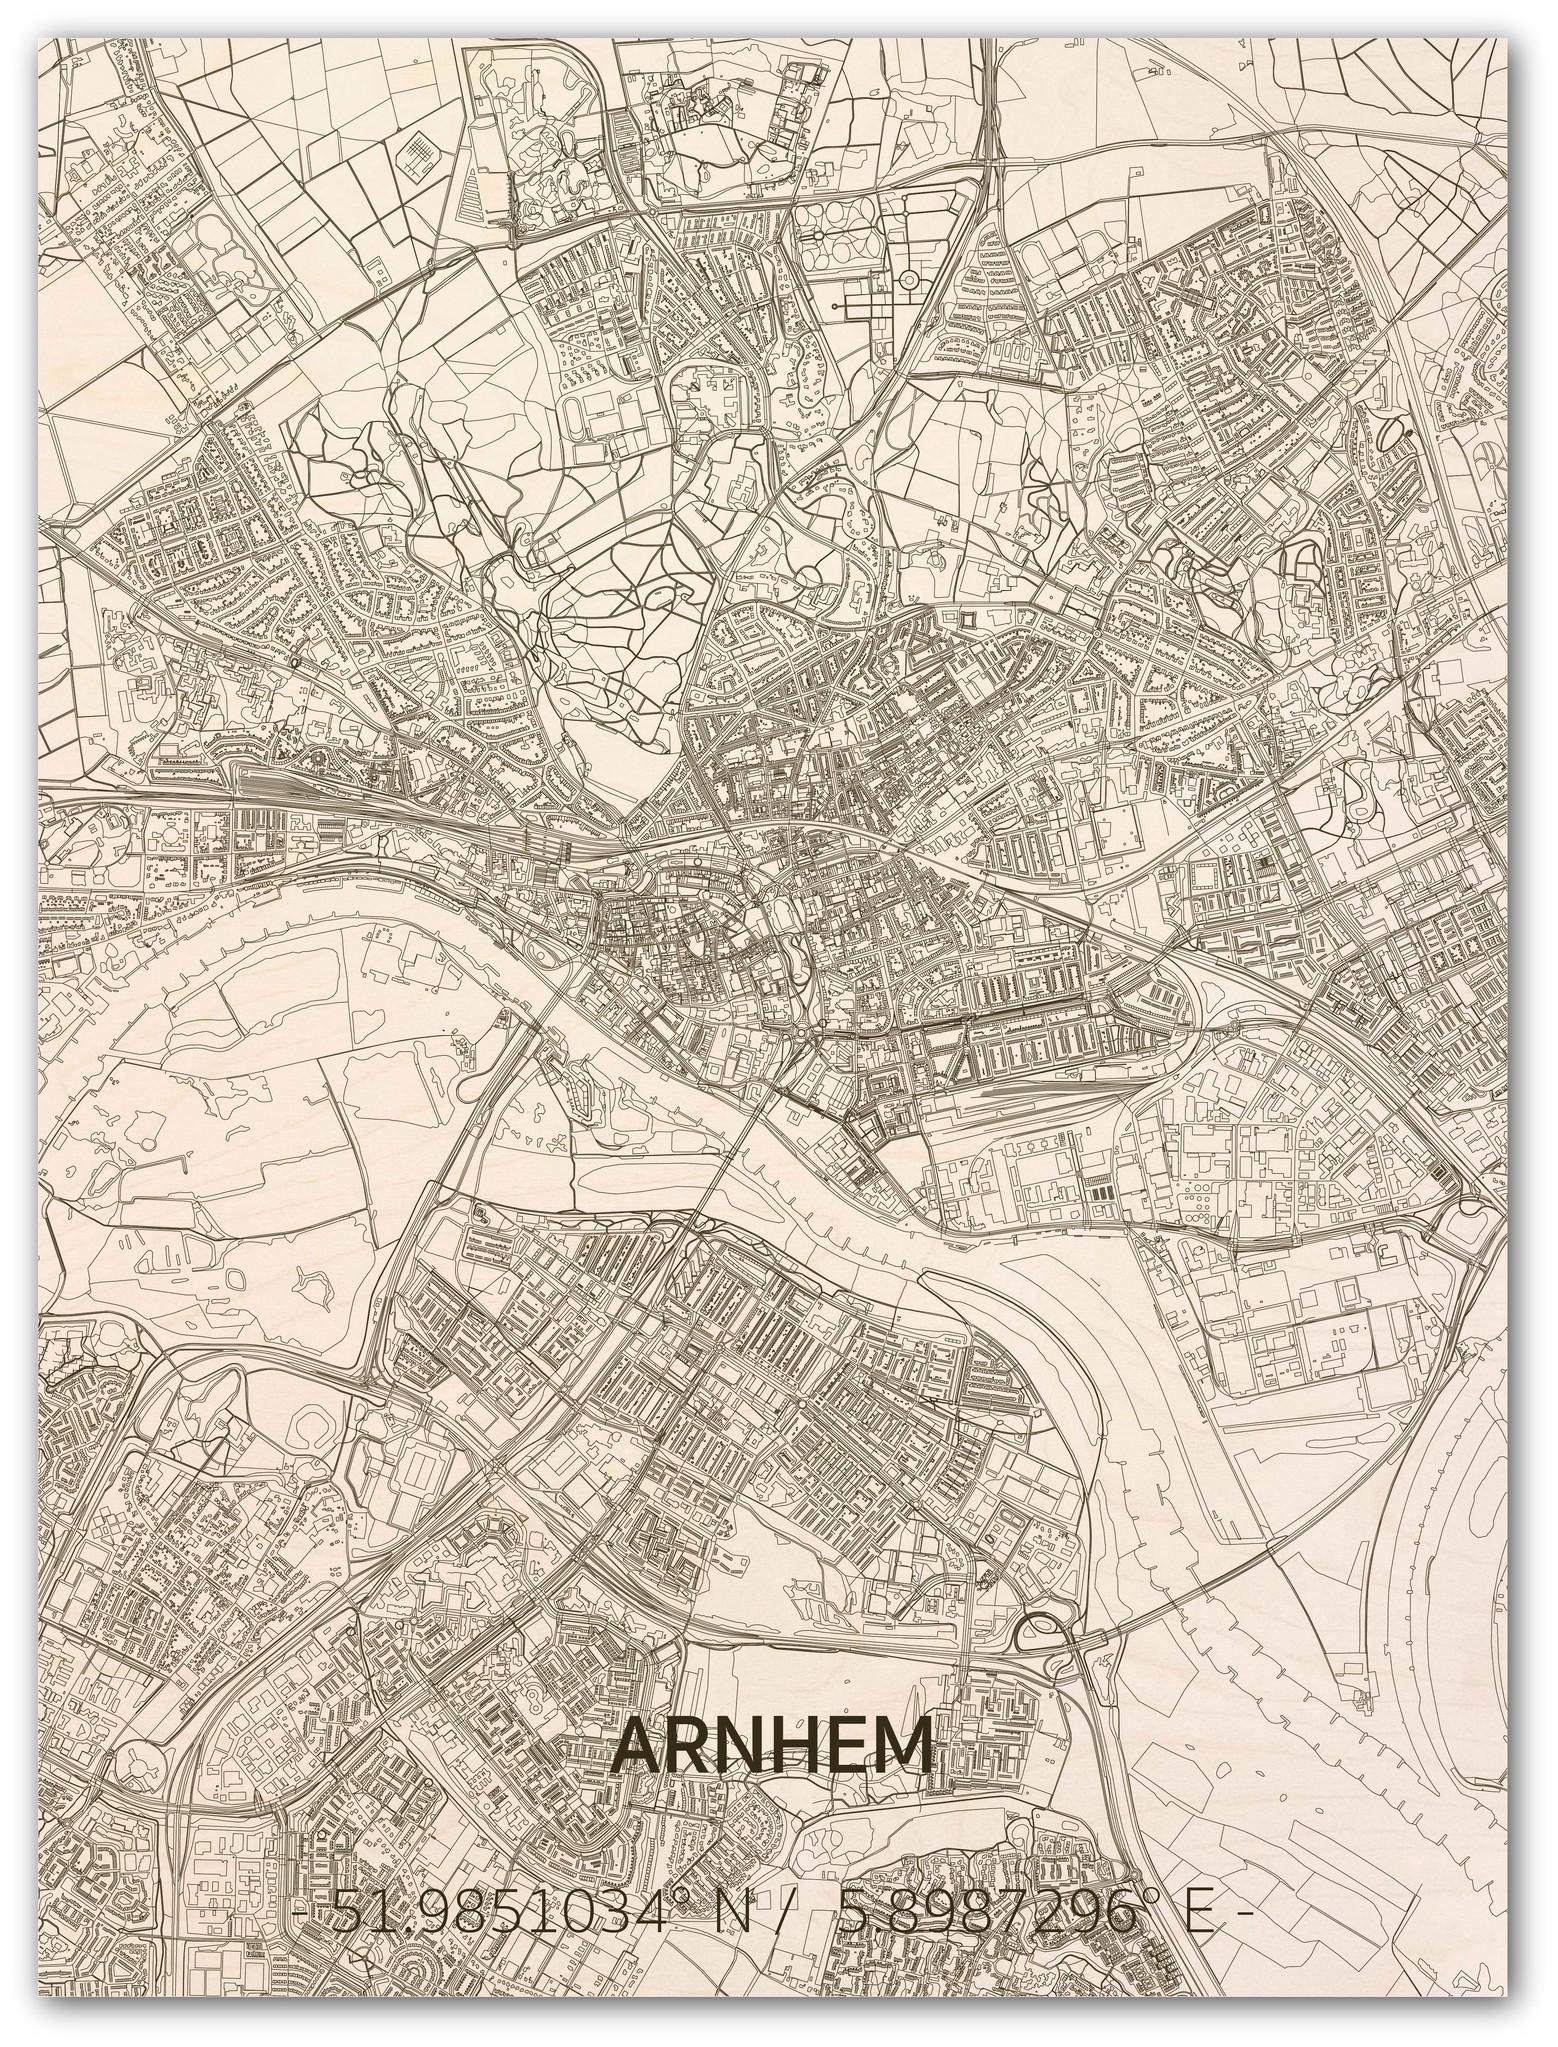 SALE | Arnhem | SALE-1